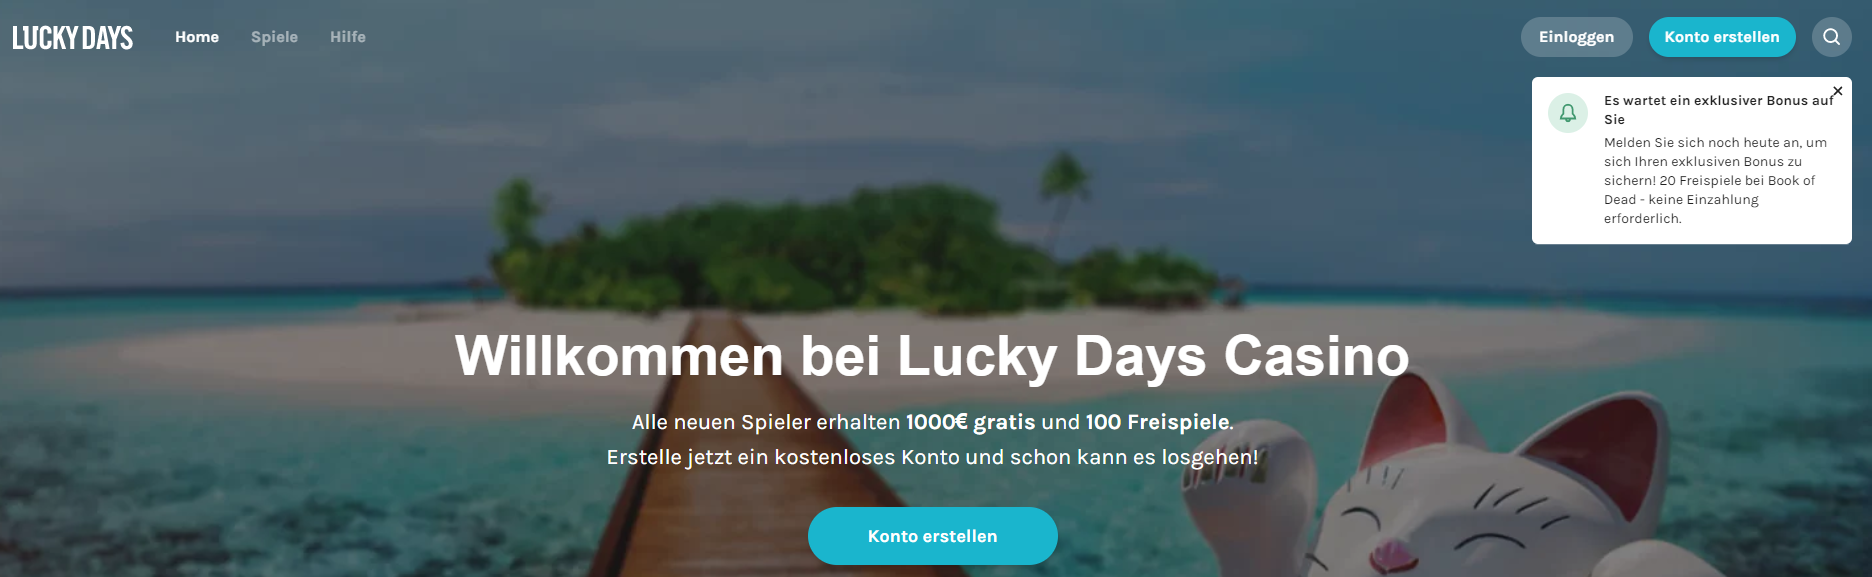 luckydays no deposit